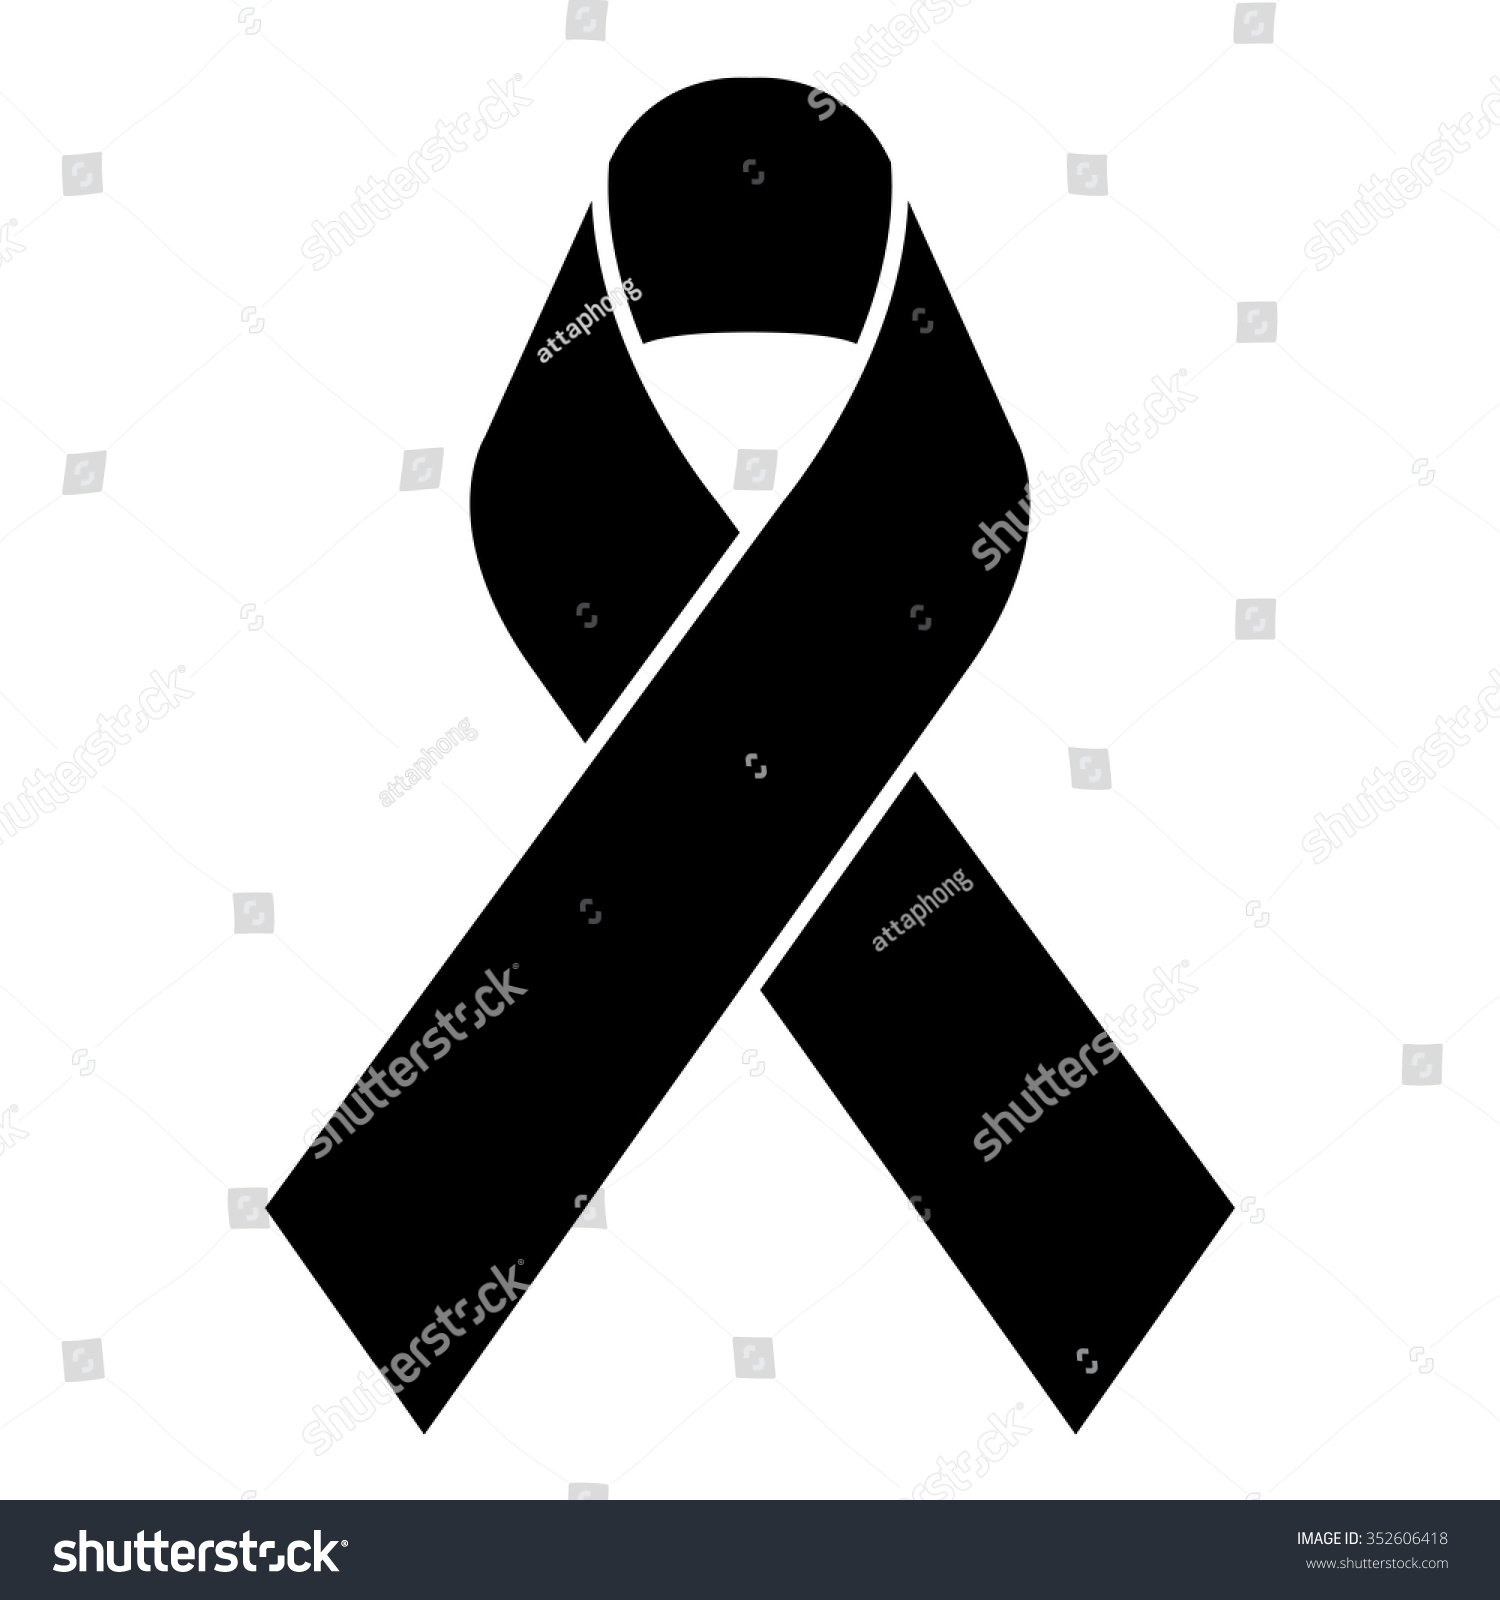 awareness ribbons vector art stock vector royalty free 352606418 rh shutterstock com Awareness Ribbon EPS Transparent Background Awareness Ribbons Us